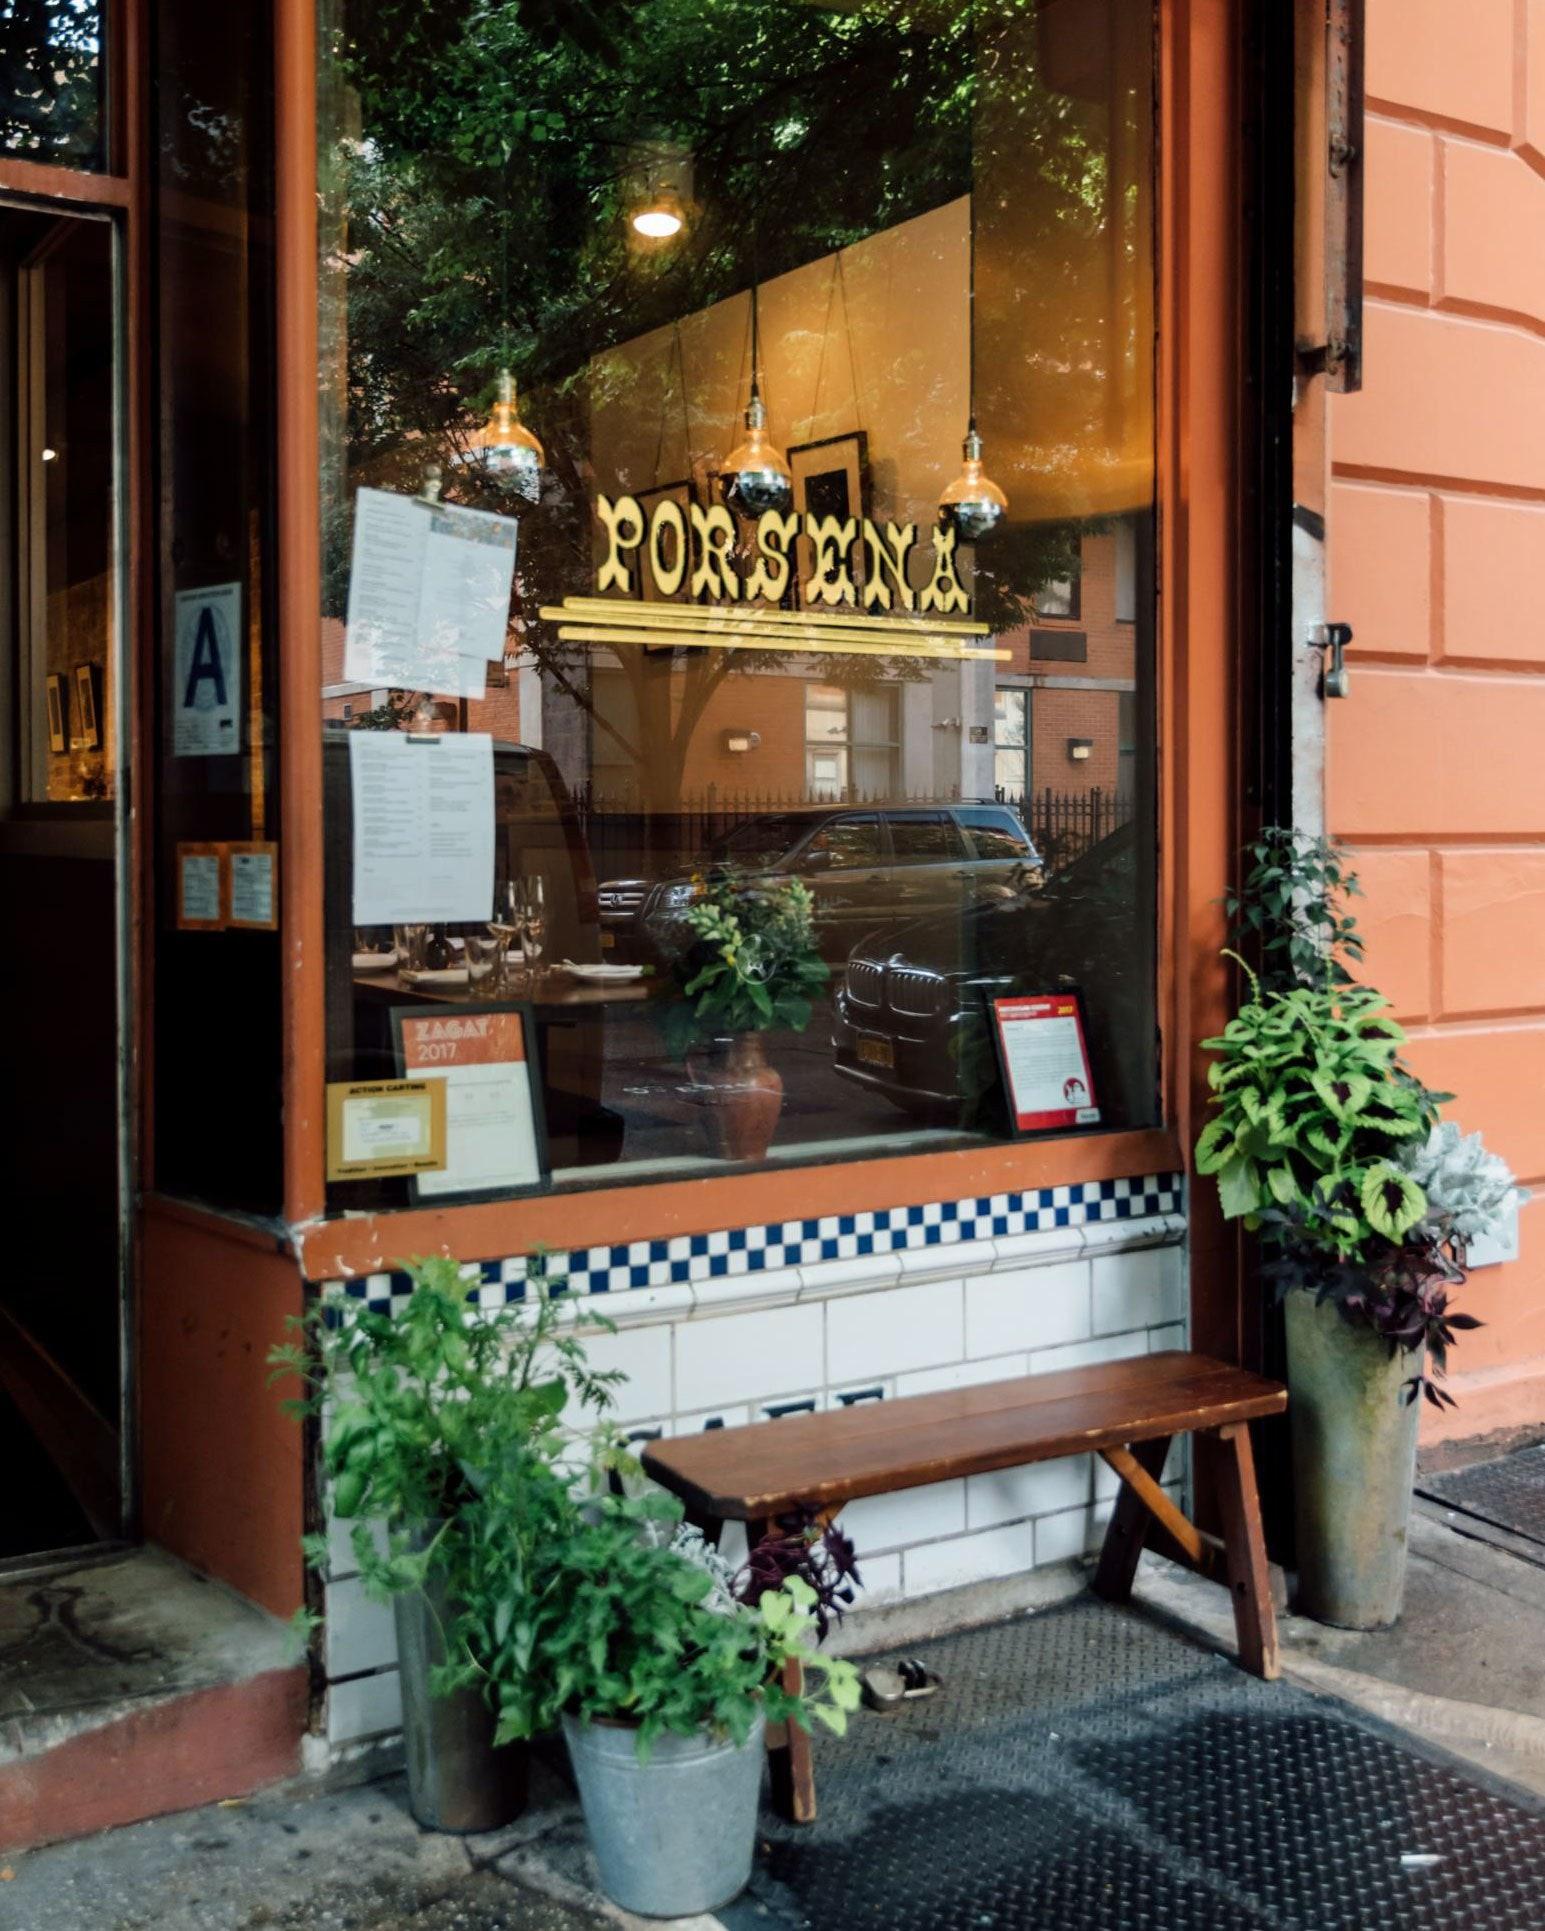 The front of the restaurant Porsena.